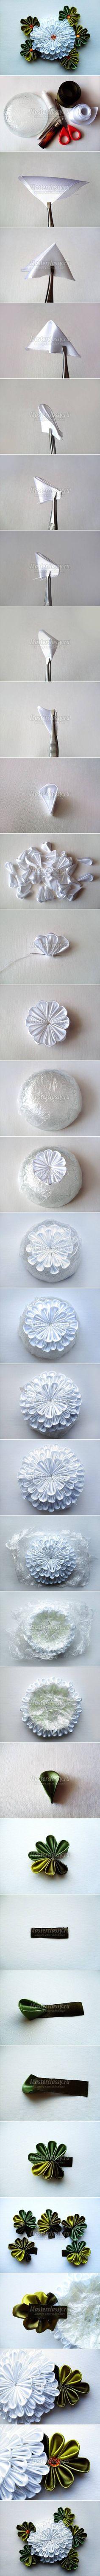 DIY White Chrysanthemum Flower